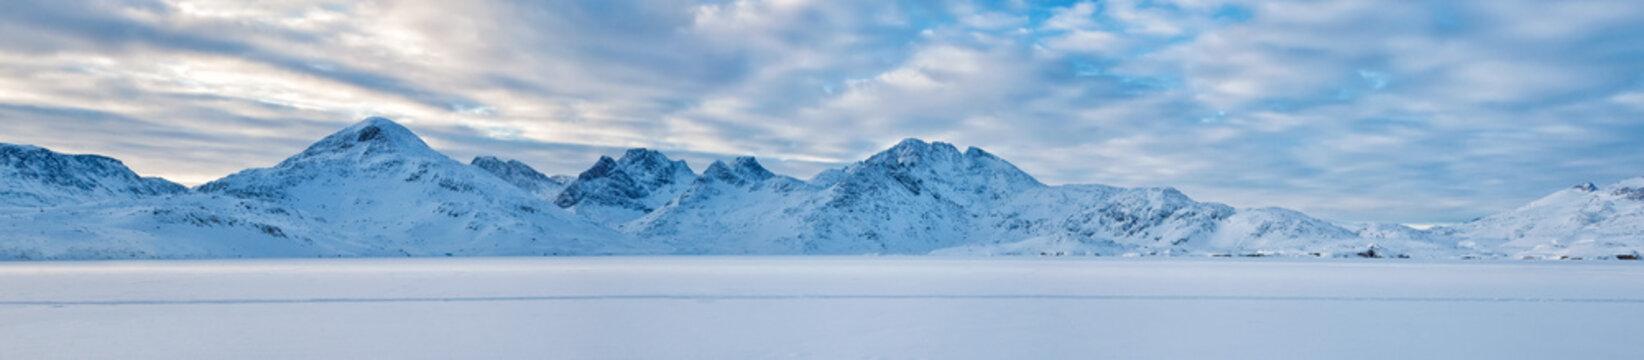 Artic winter scene - banner background image